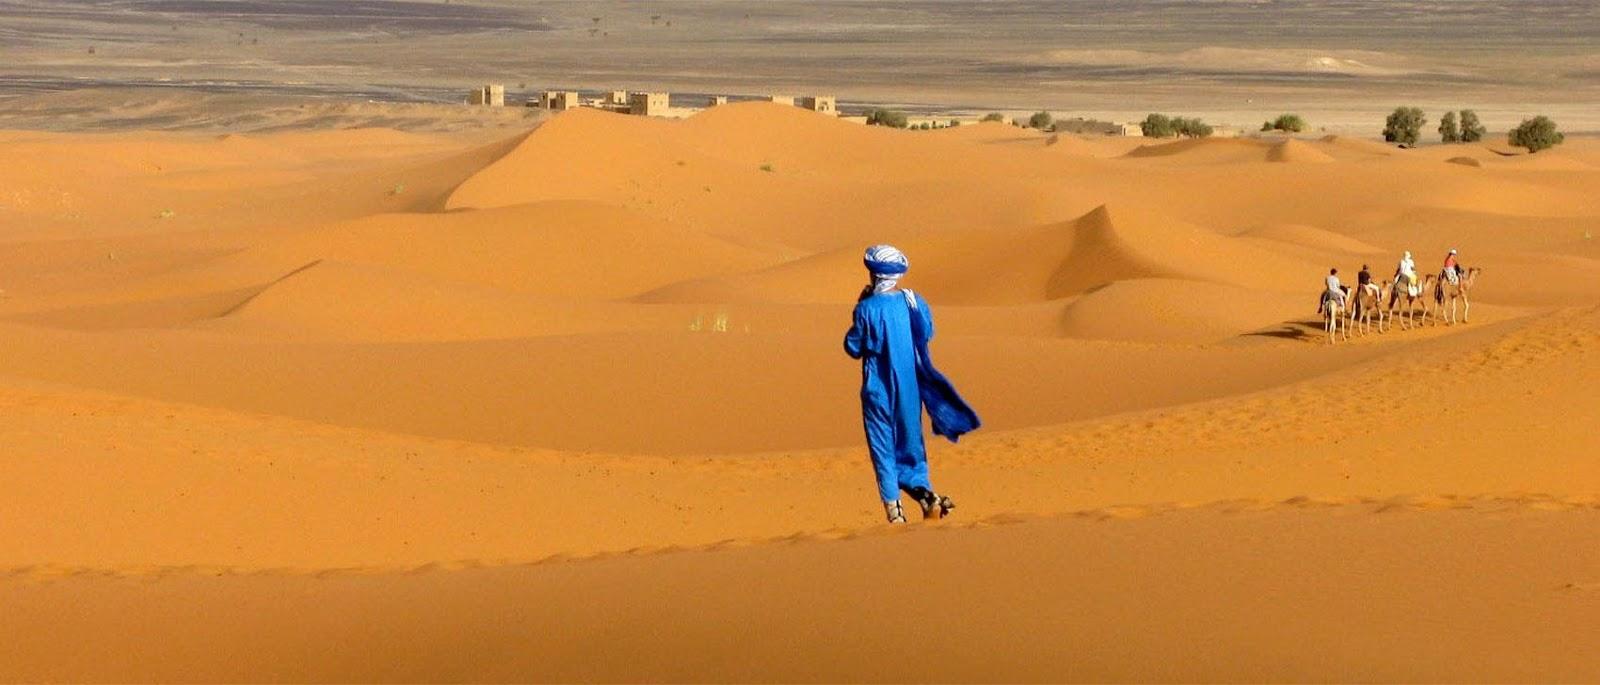 C:\Users\rwil313\Desktop\desert in abu dhabi.jpg